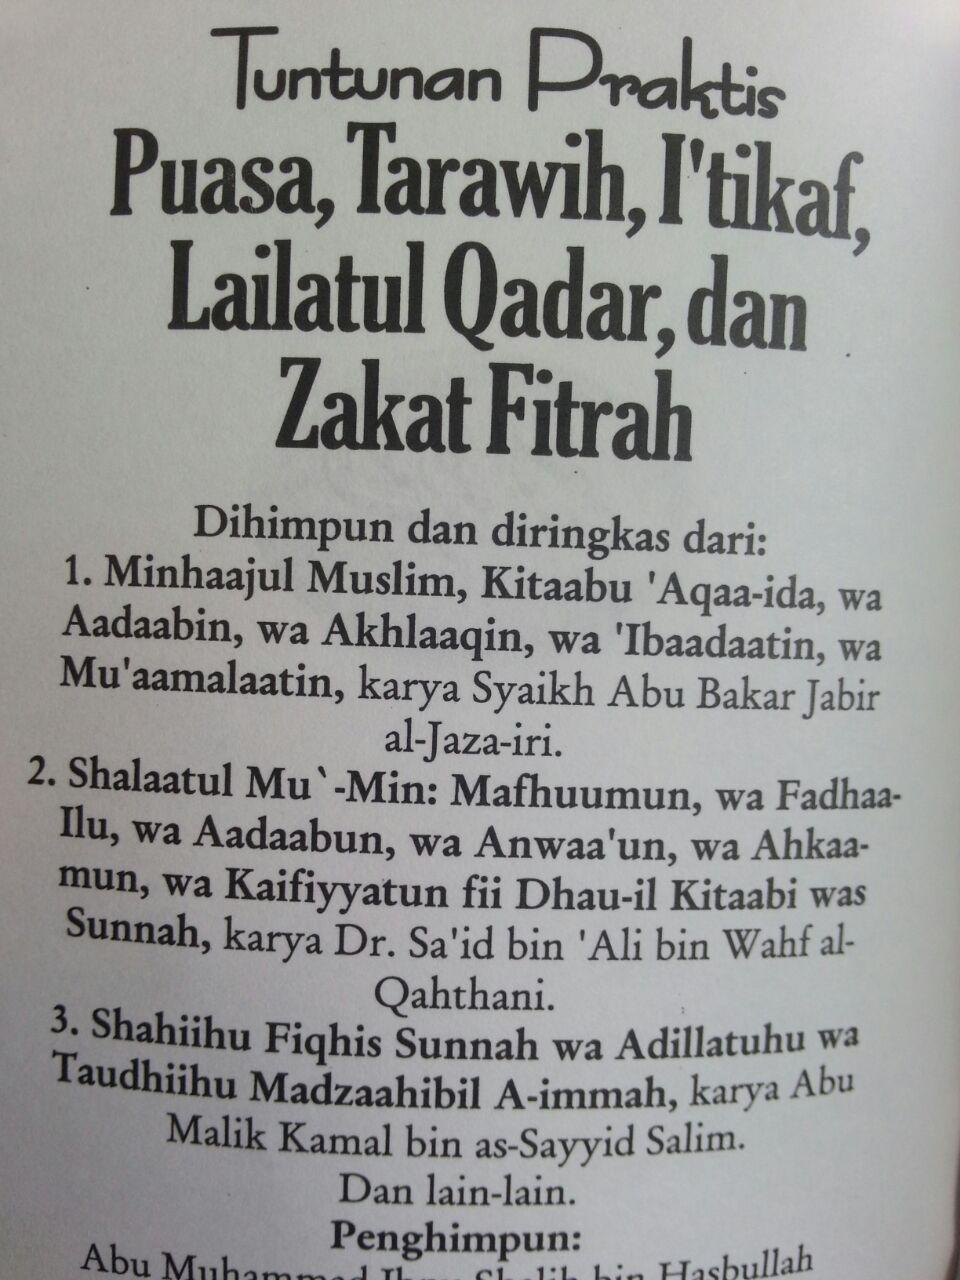 Buku Saku Tuntunan Praktis Puasa Tarawih I'tikaf Lailatul Qadar dan Zakat Fitrah isi